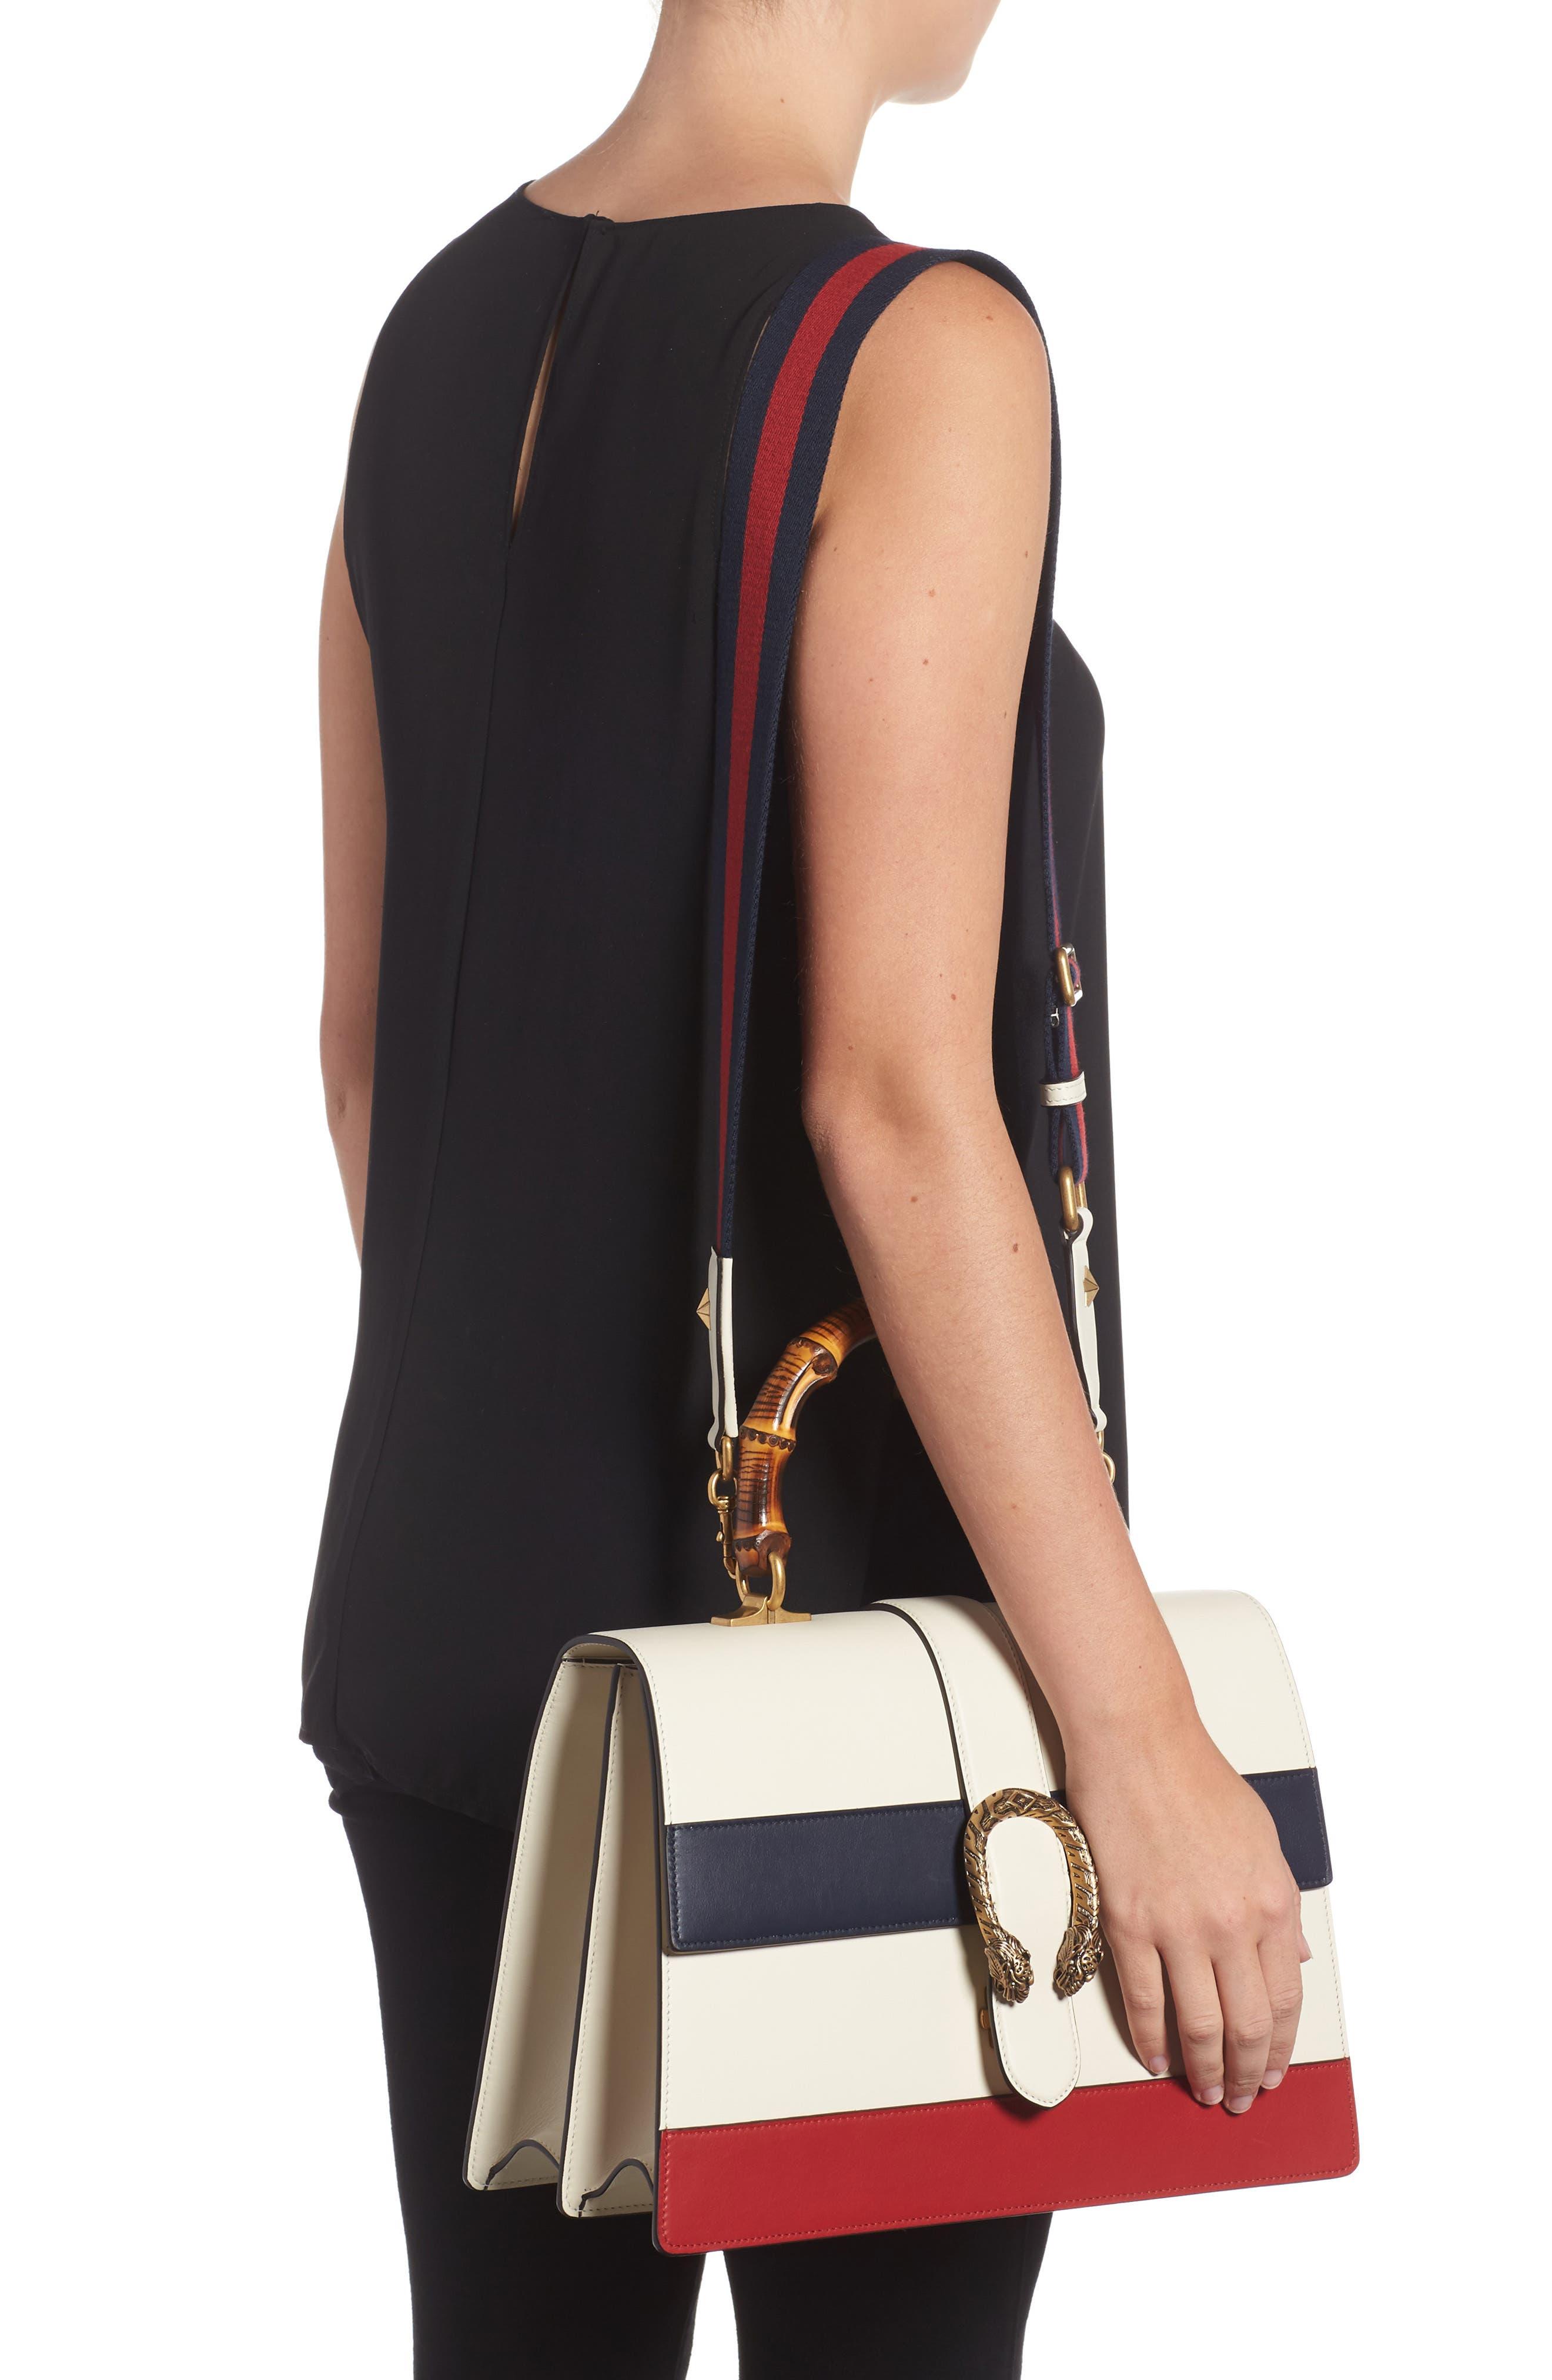 GUCCI, Large Dionysus Top Handle Leather Shoulder Bag, Alternate thumbnail 2, color, MYSTIC WHITE/ BLUE/ RED